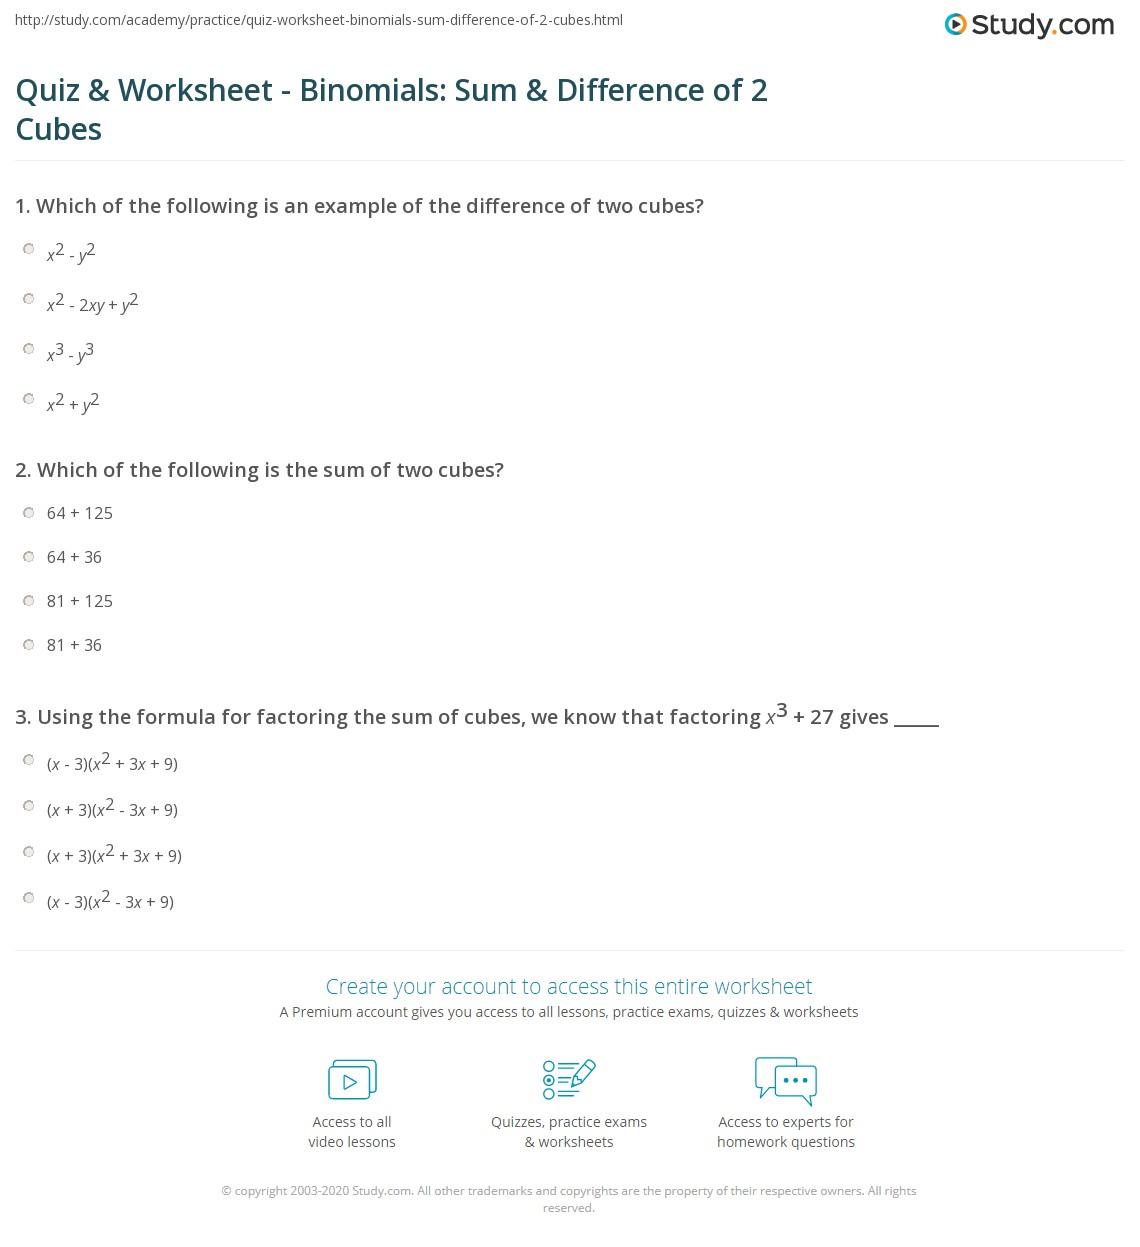 hight resolution of Quiz \u0026 Worksheet - Binomials: Sum \u0026 Difference of 2 Cubes   Study.com